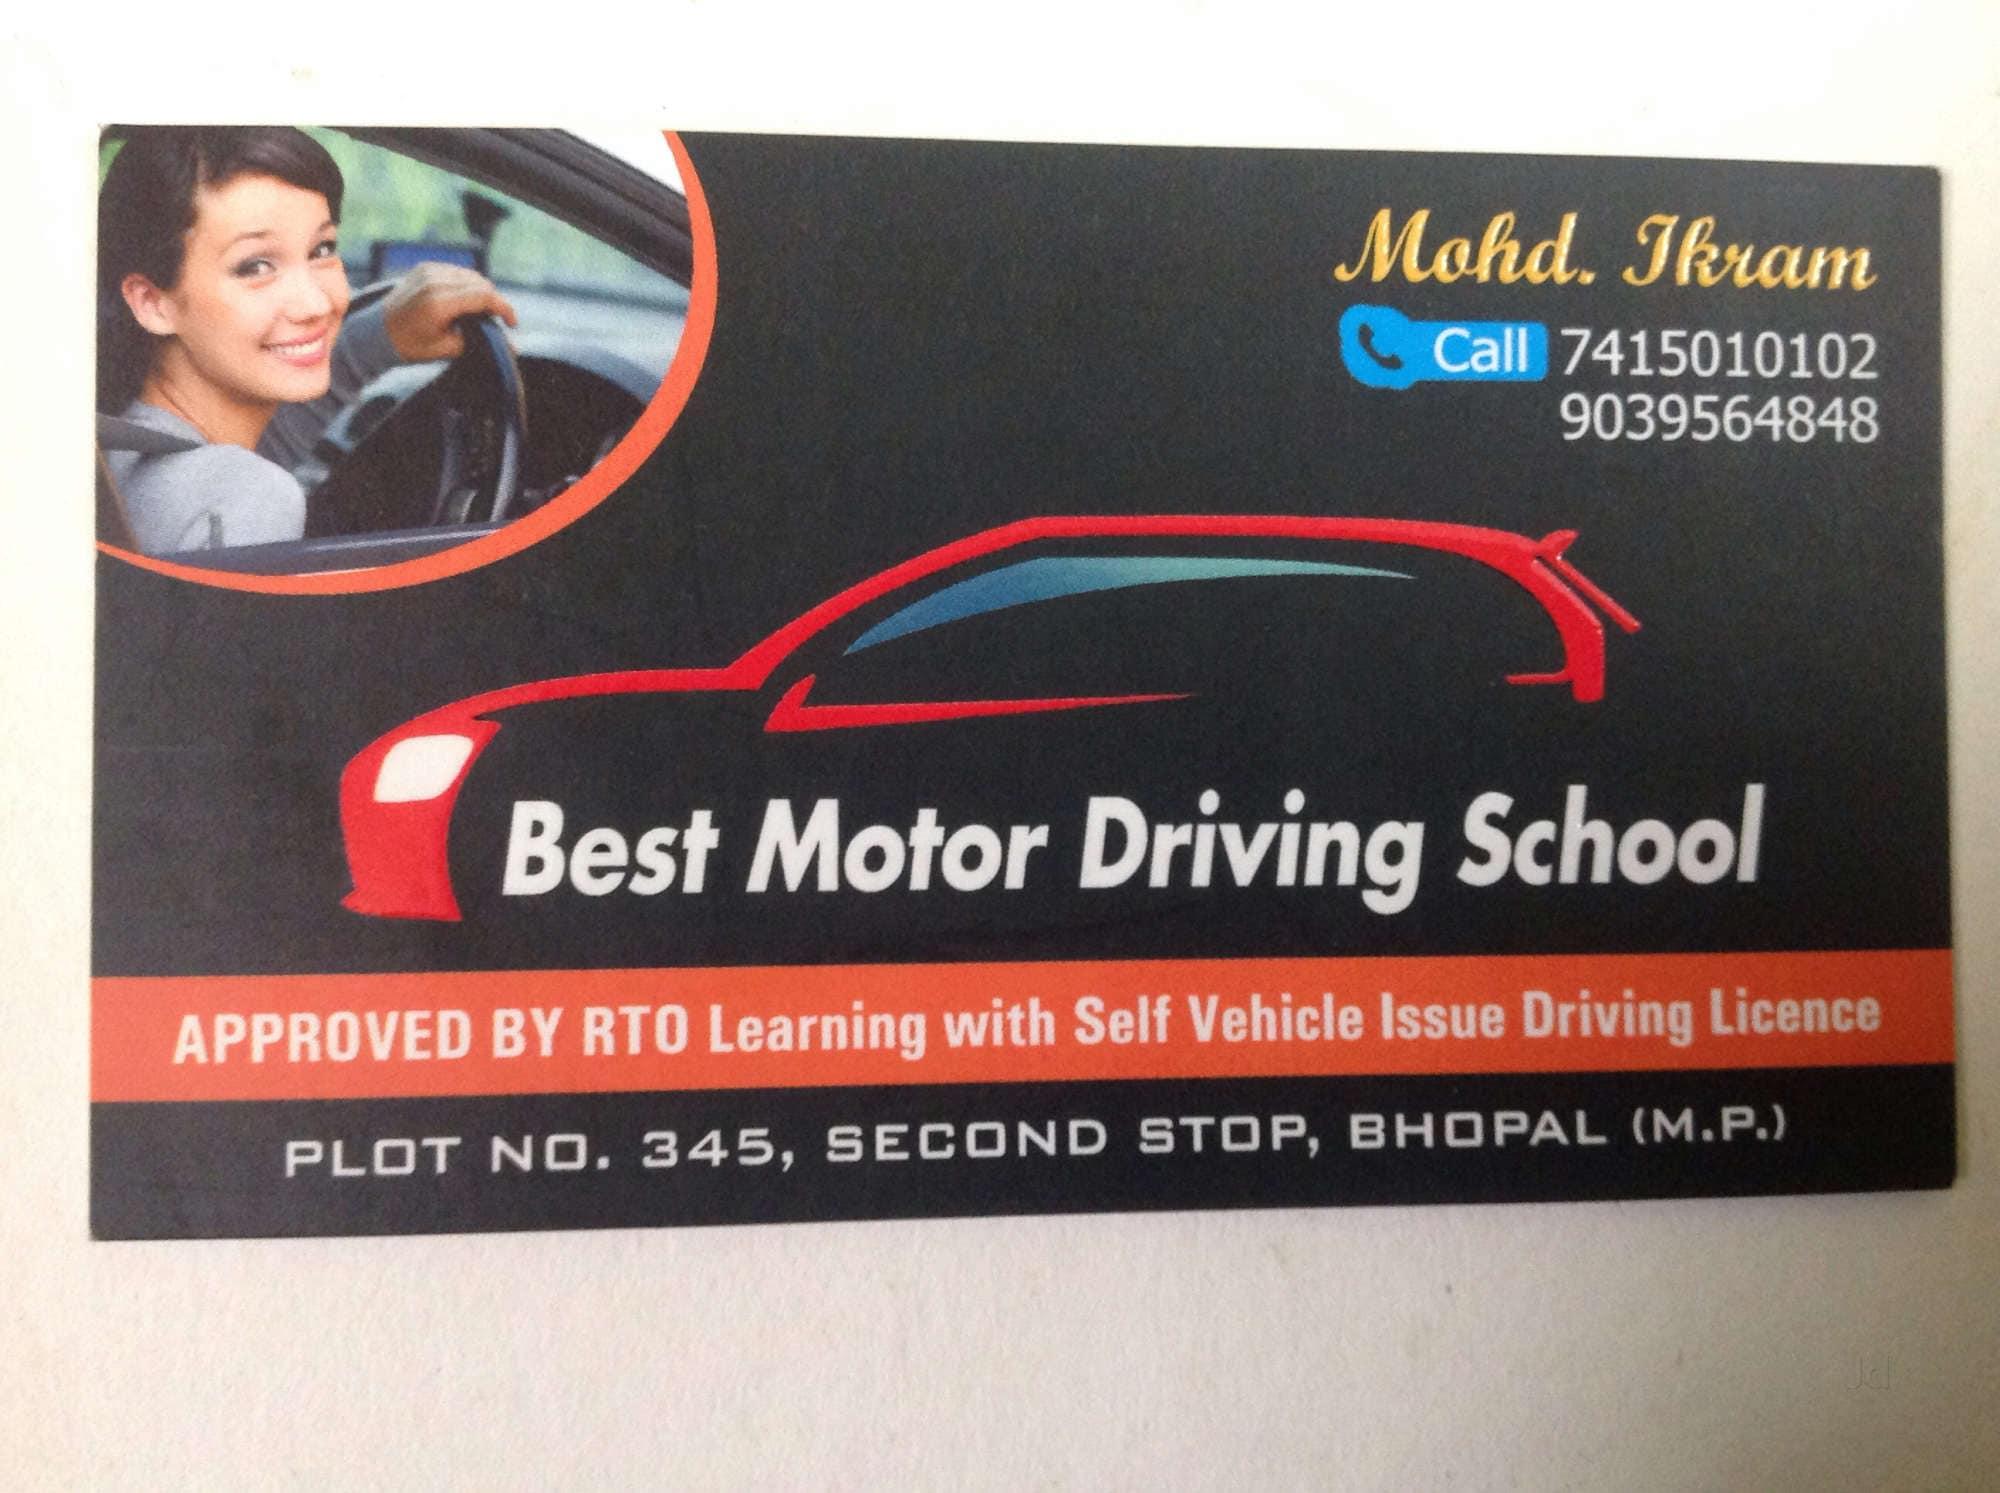 Top 50 Driving Schools in Bhopal - Best Motor Training